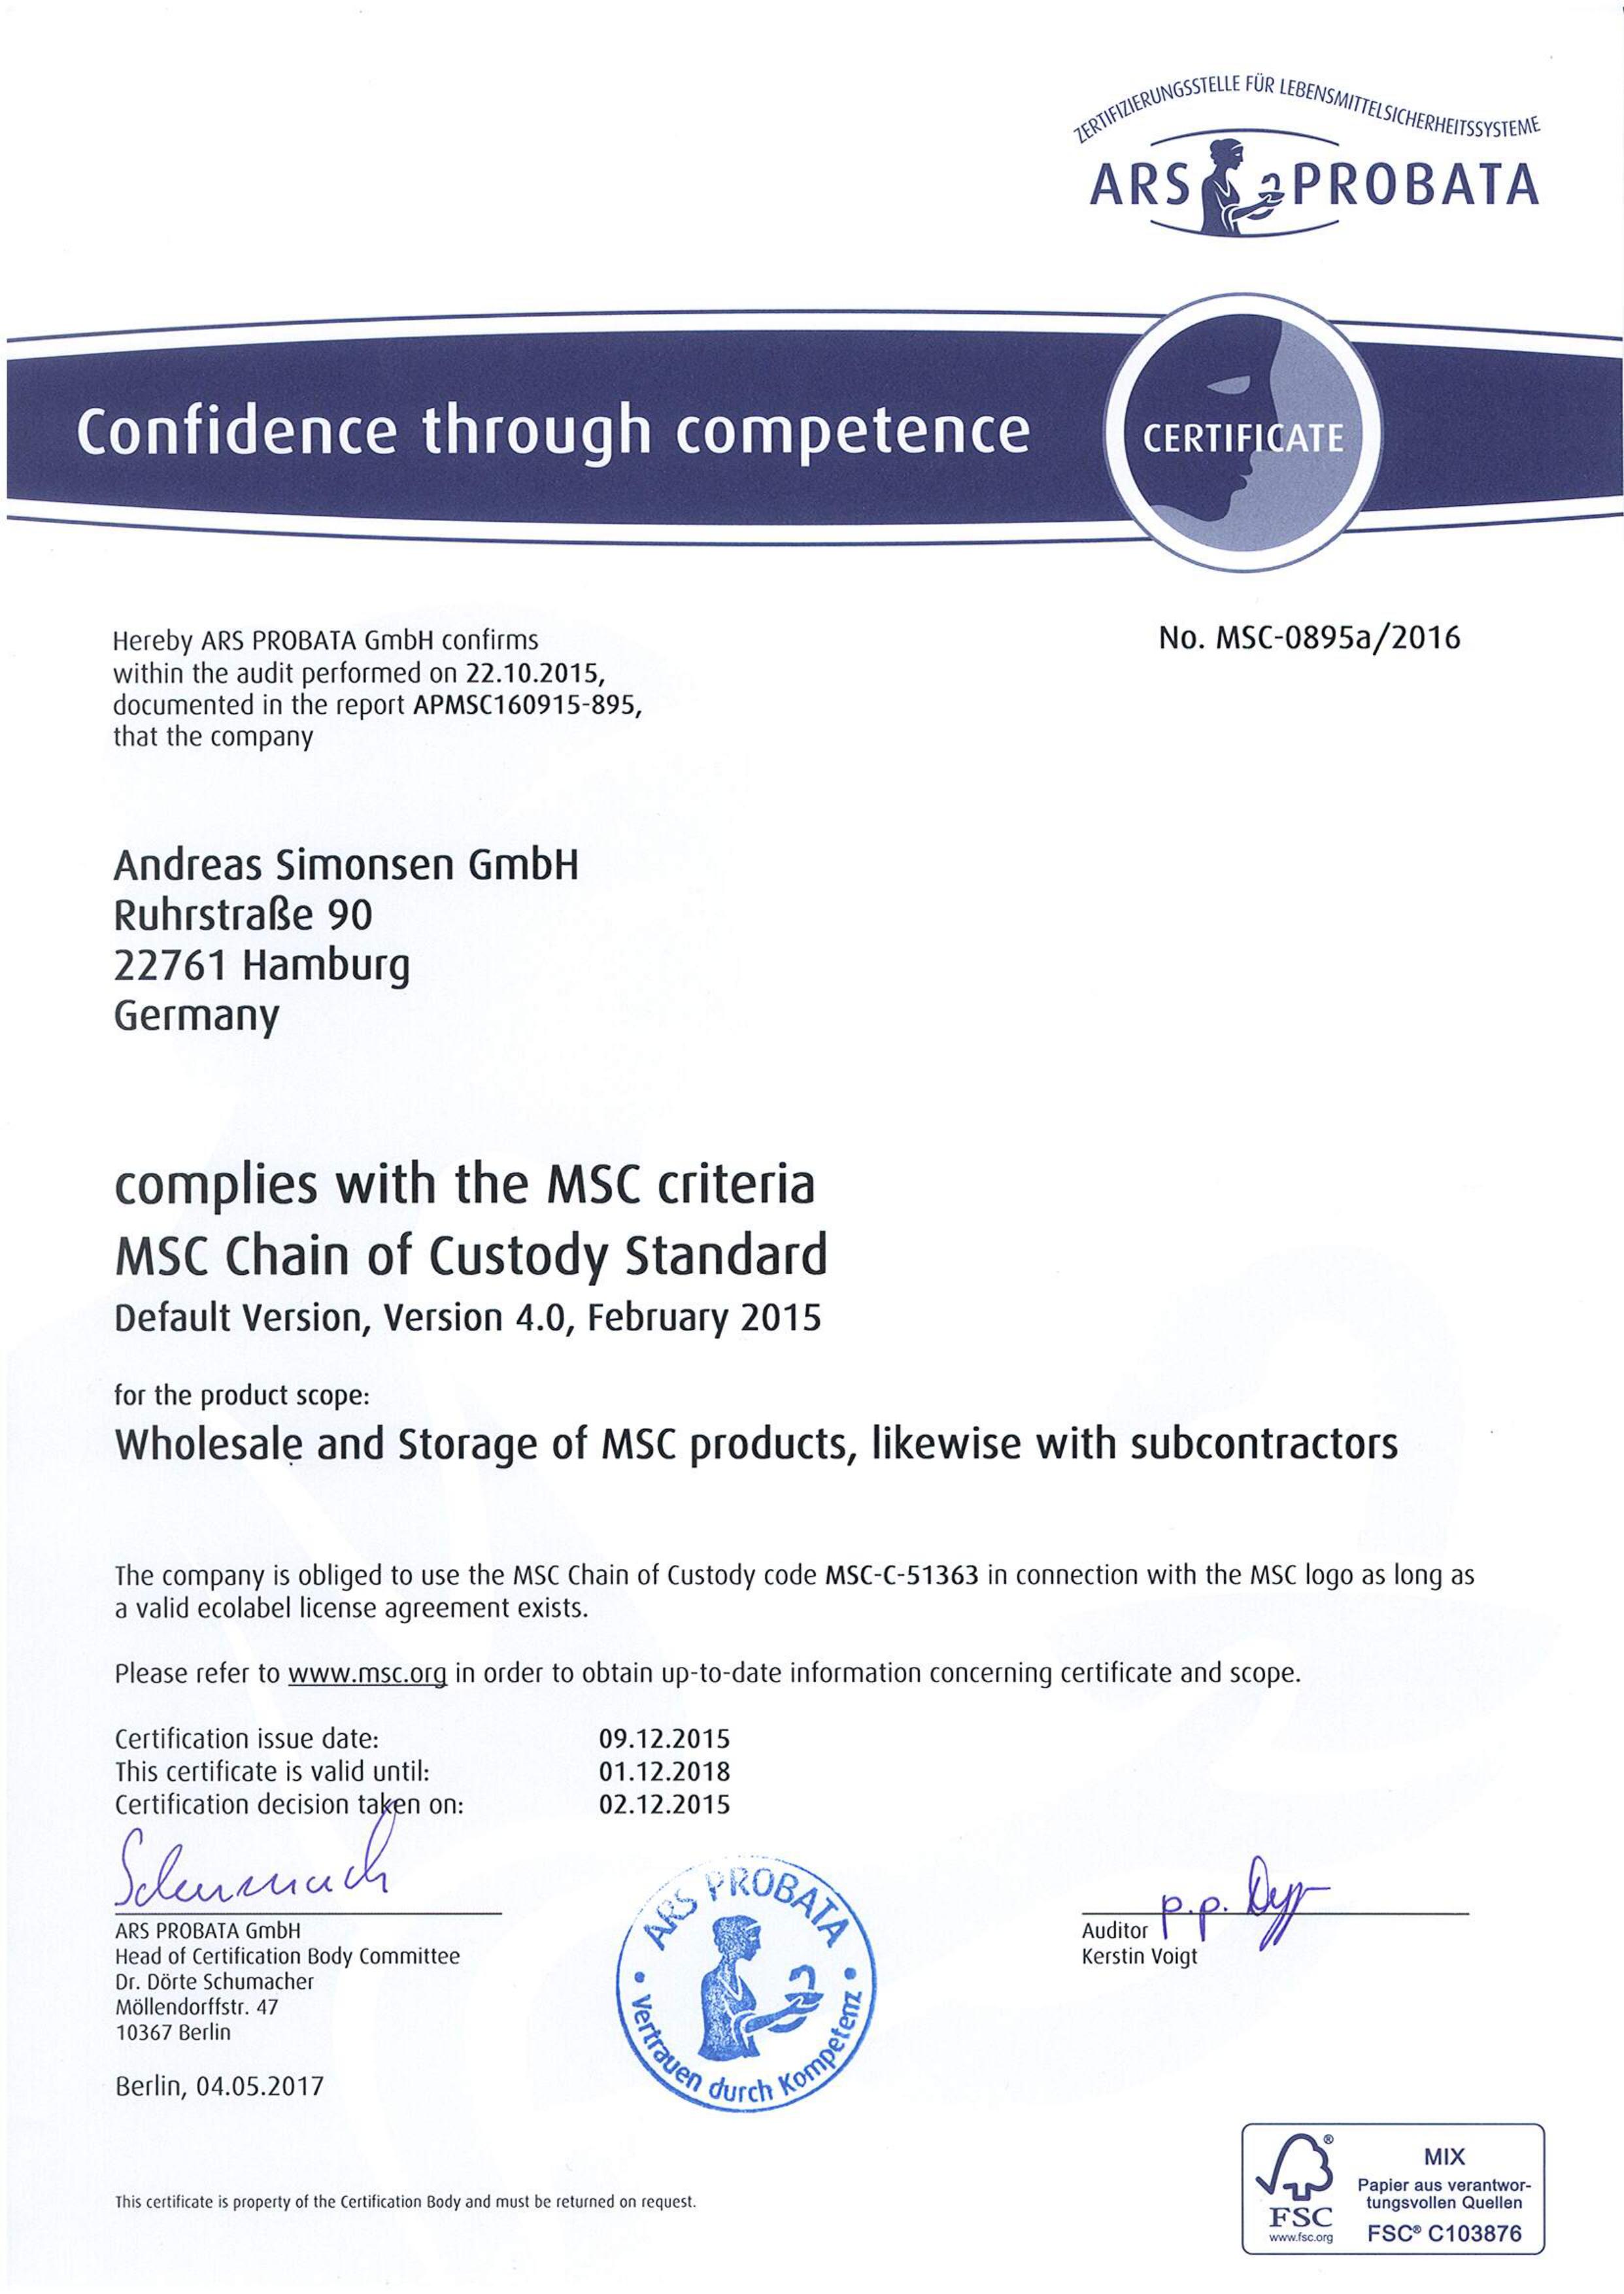 Msc certificate andreas simonsen gmbh msc certificate xflitez Choice Image